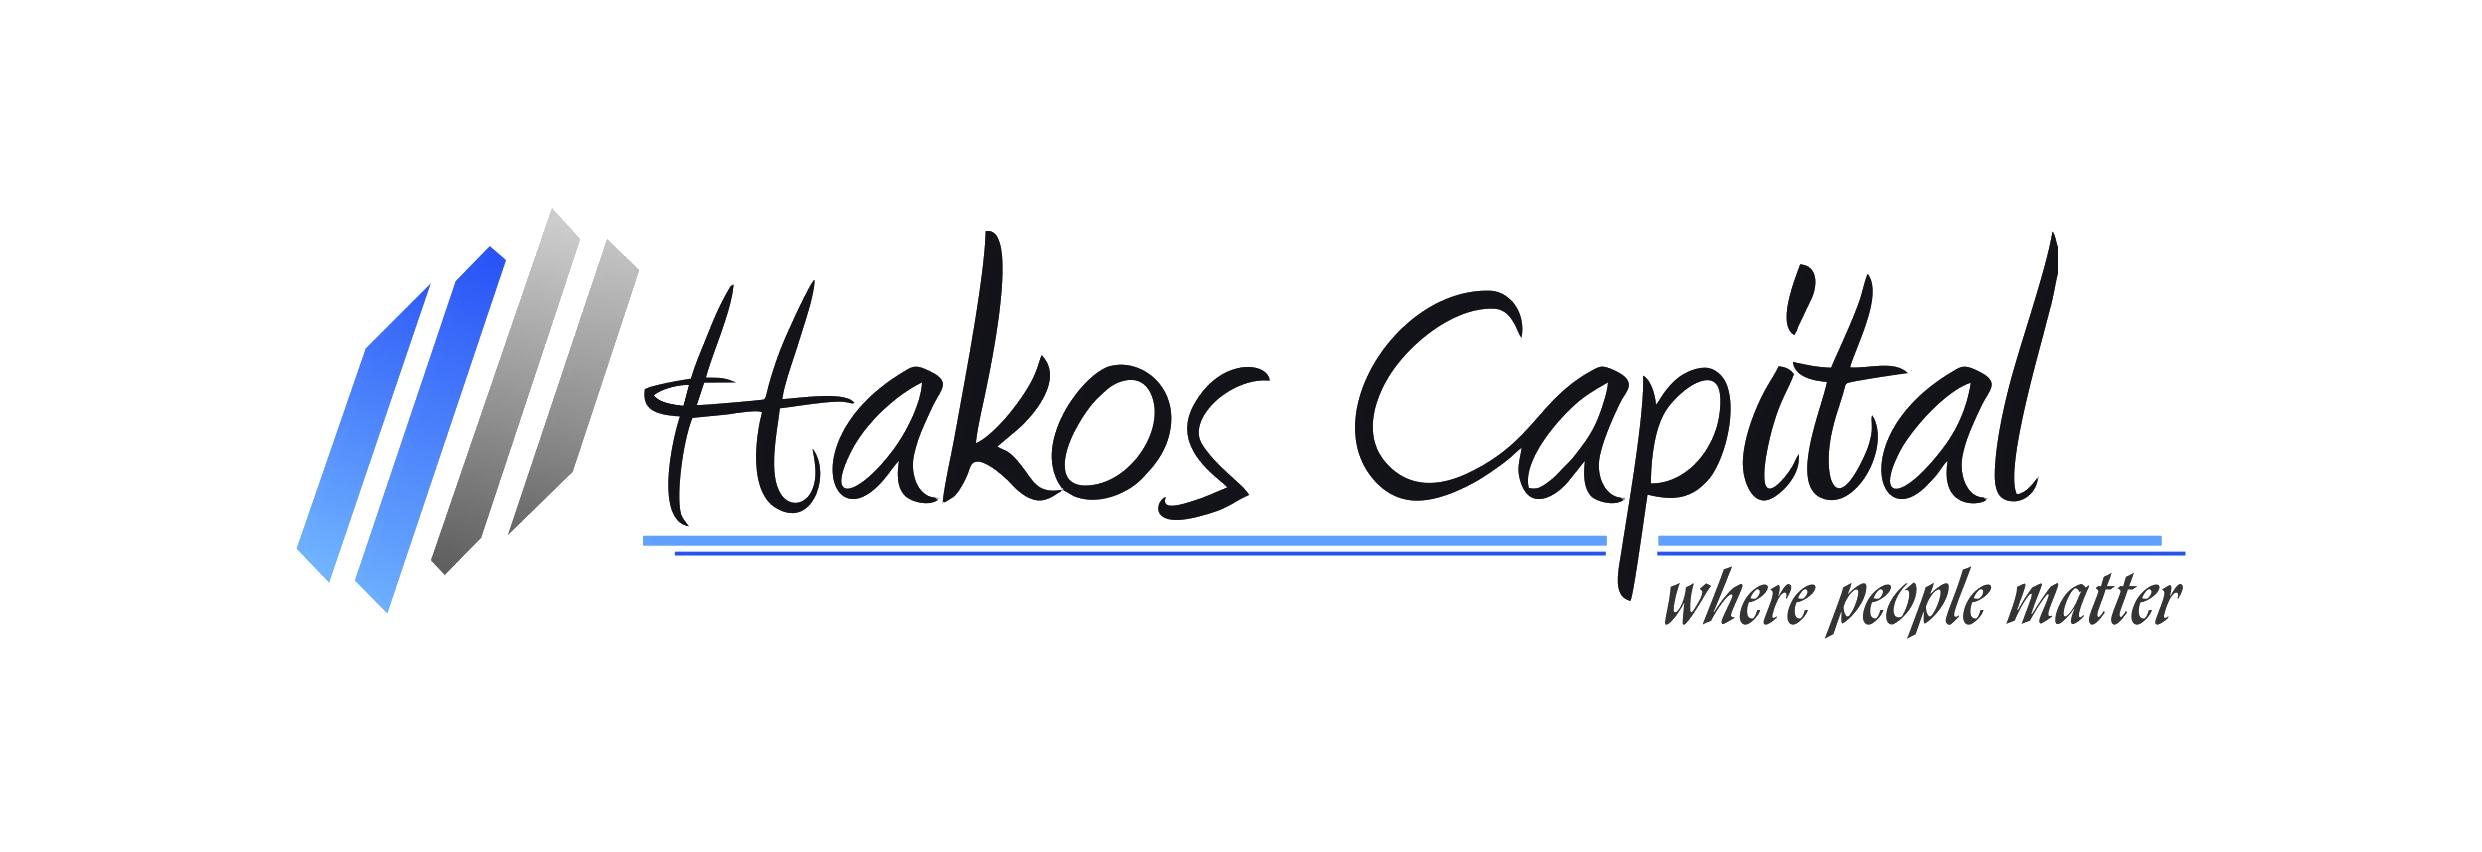 Hakos Capital